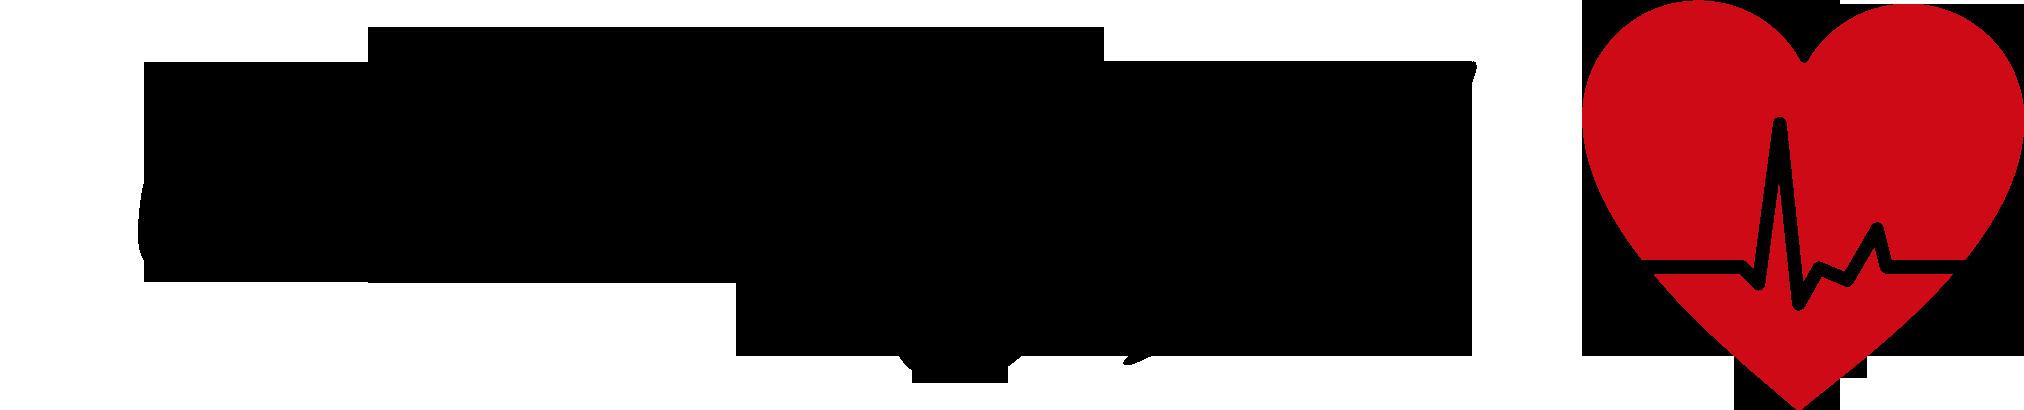 main logo Full